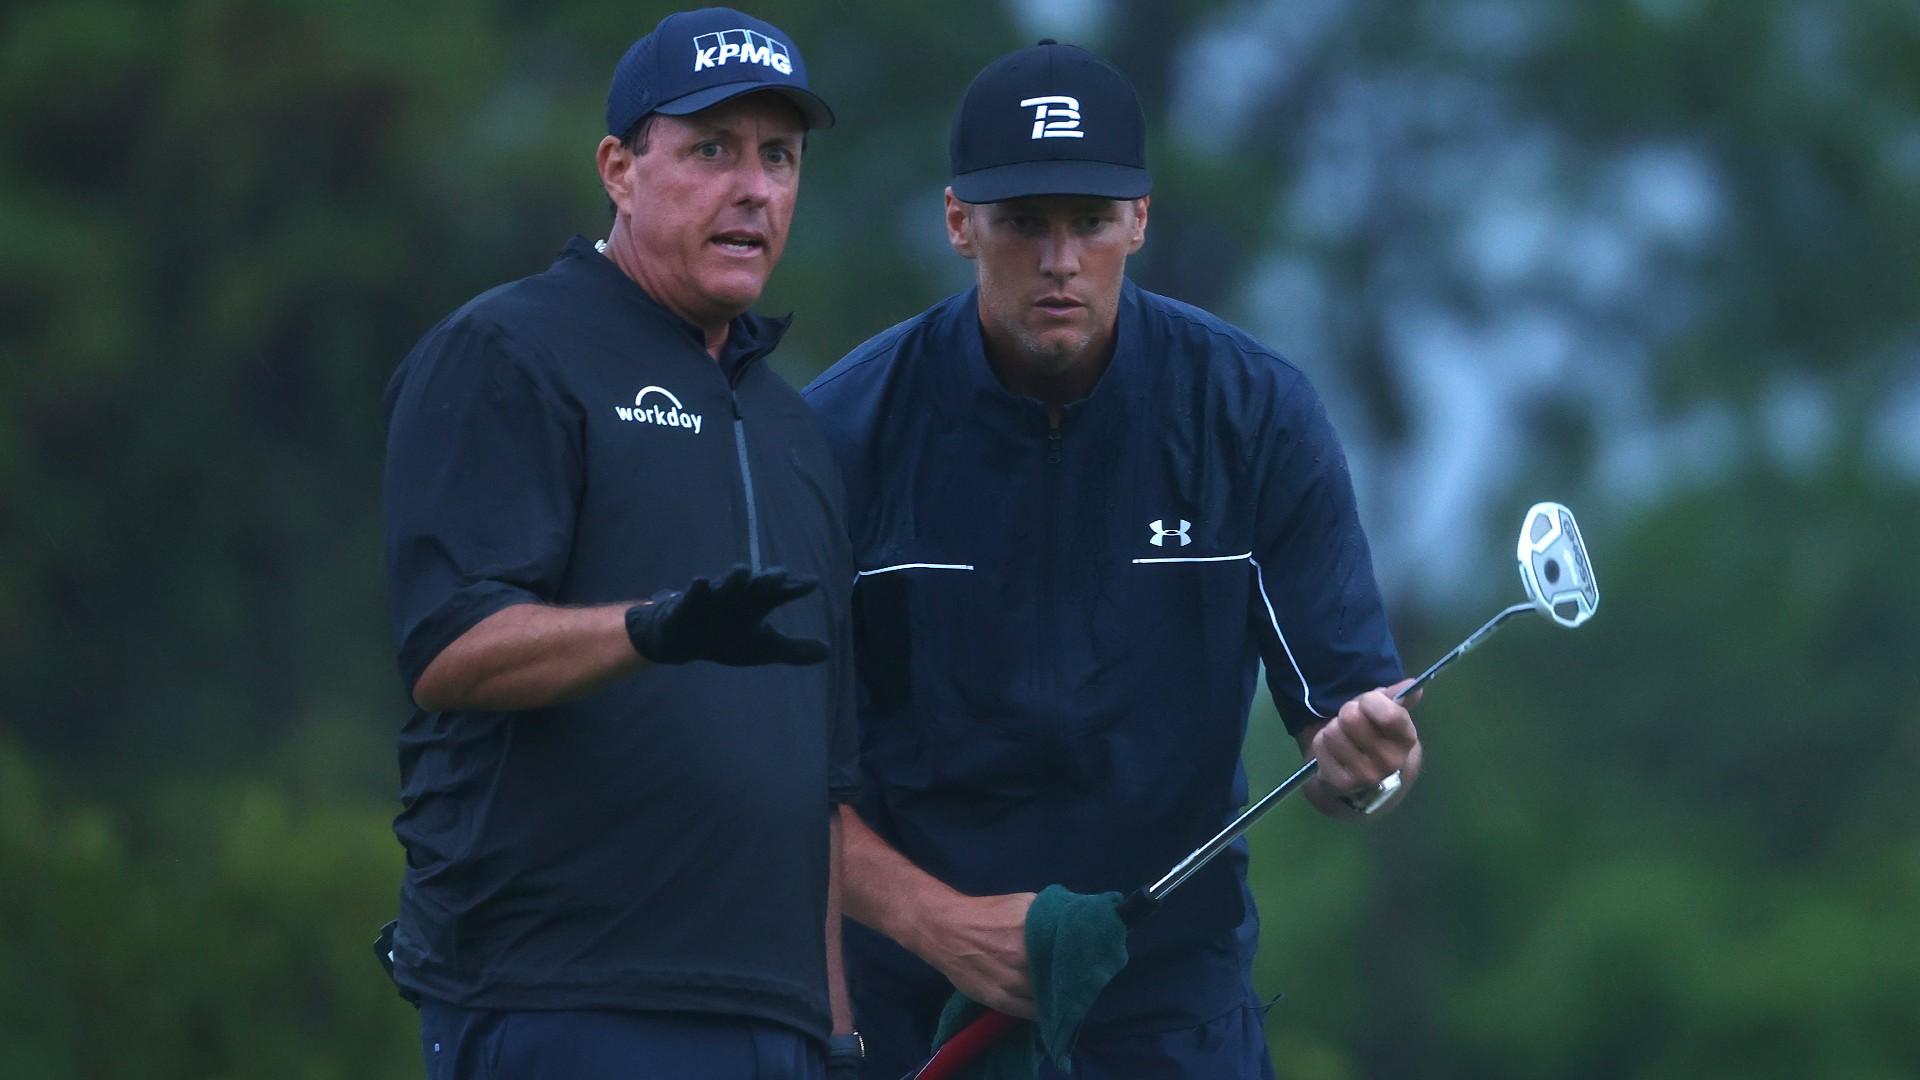 2021 Match Golf Odds, Prediction for Phil Mickelson-Tom Brady vs. Bryson DeChambeau-Aaron Rodgers